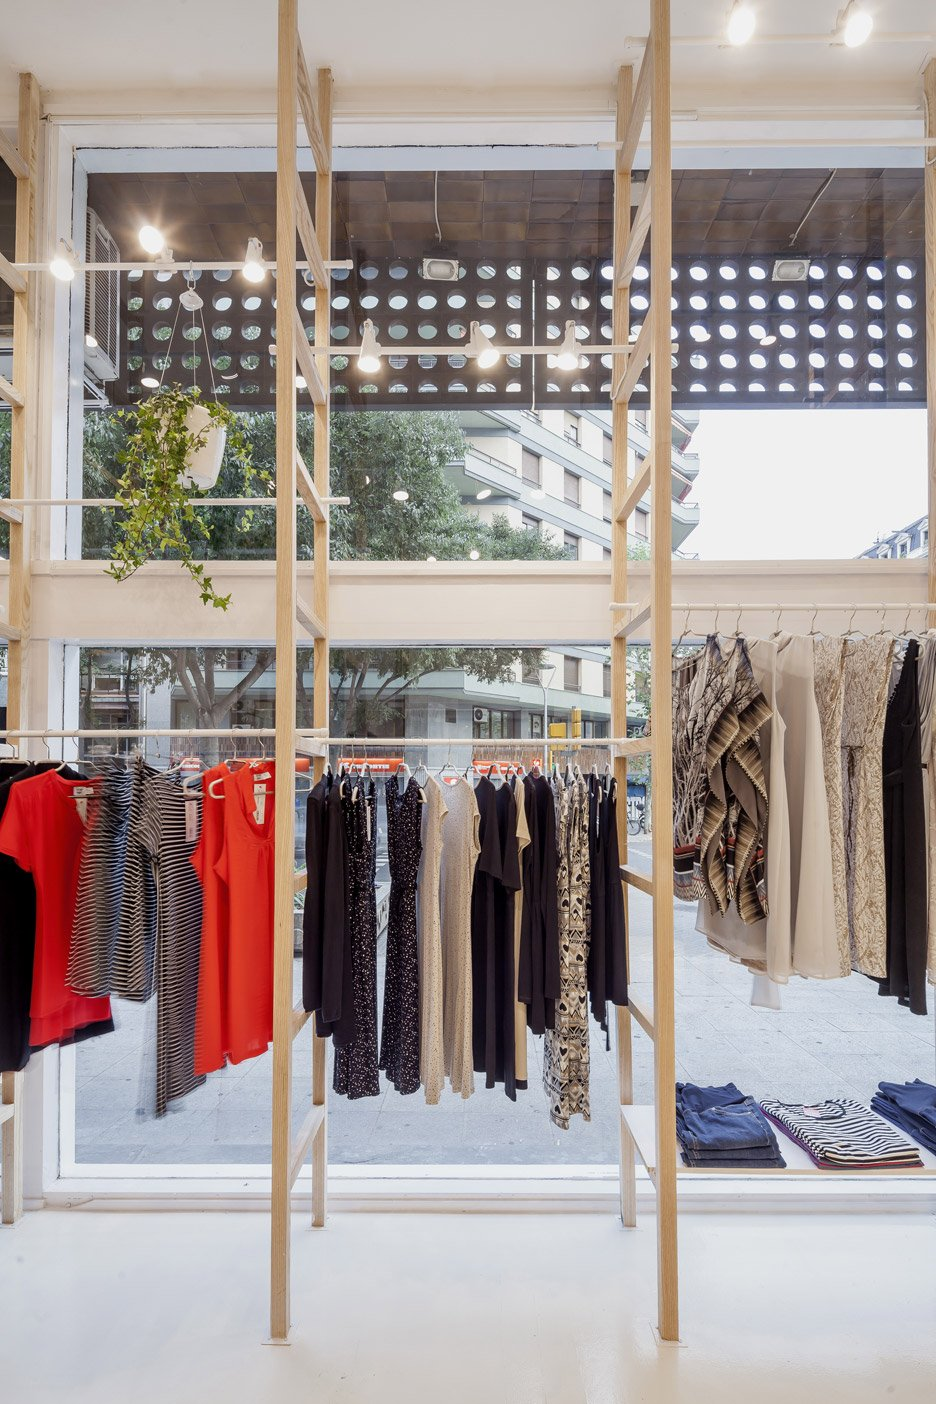 Mit Mat Mama Store in Barcelona by Román Izquierdo Bouldstridge